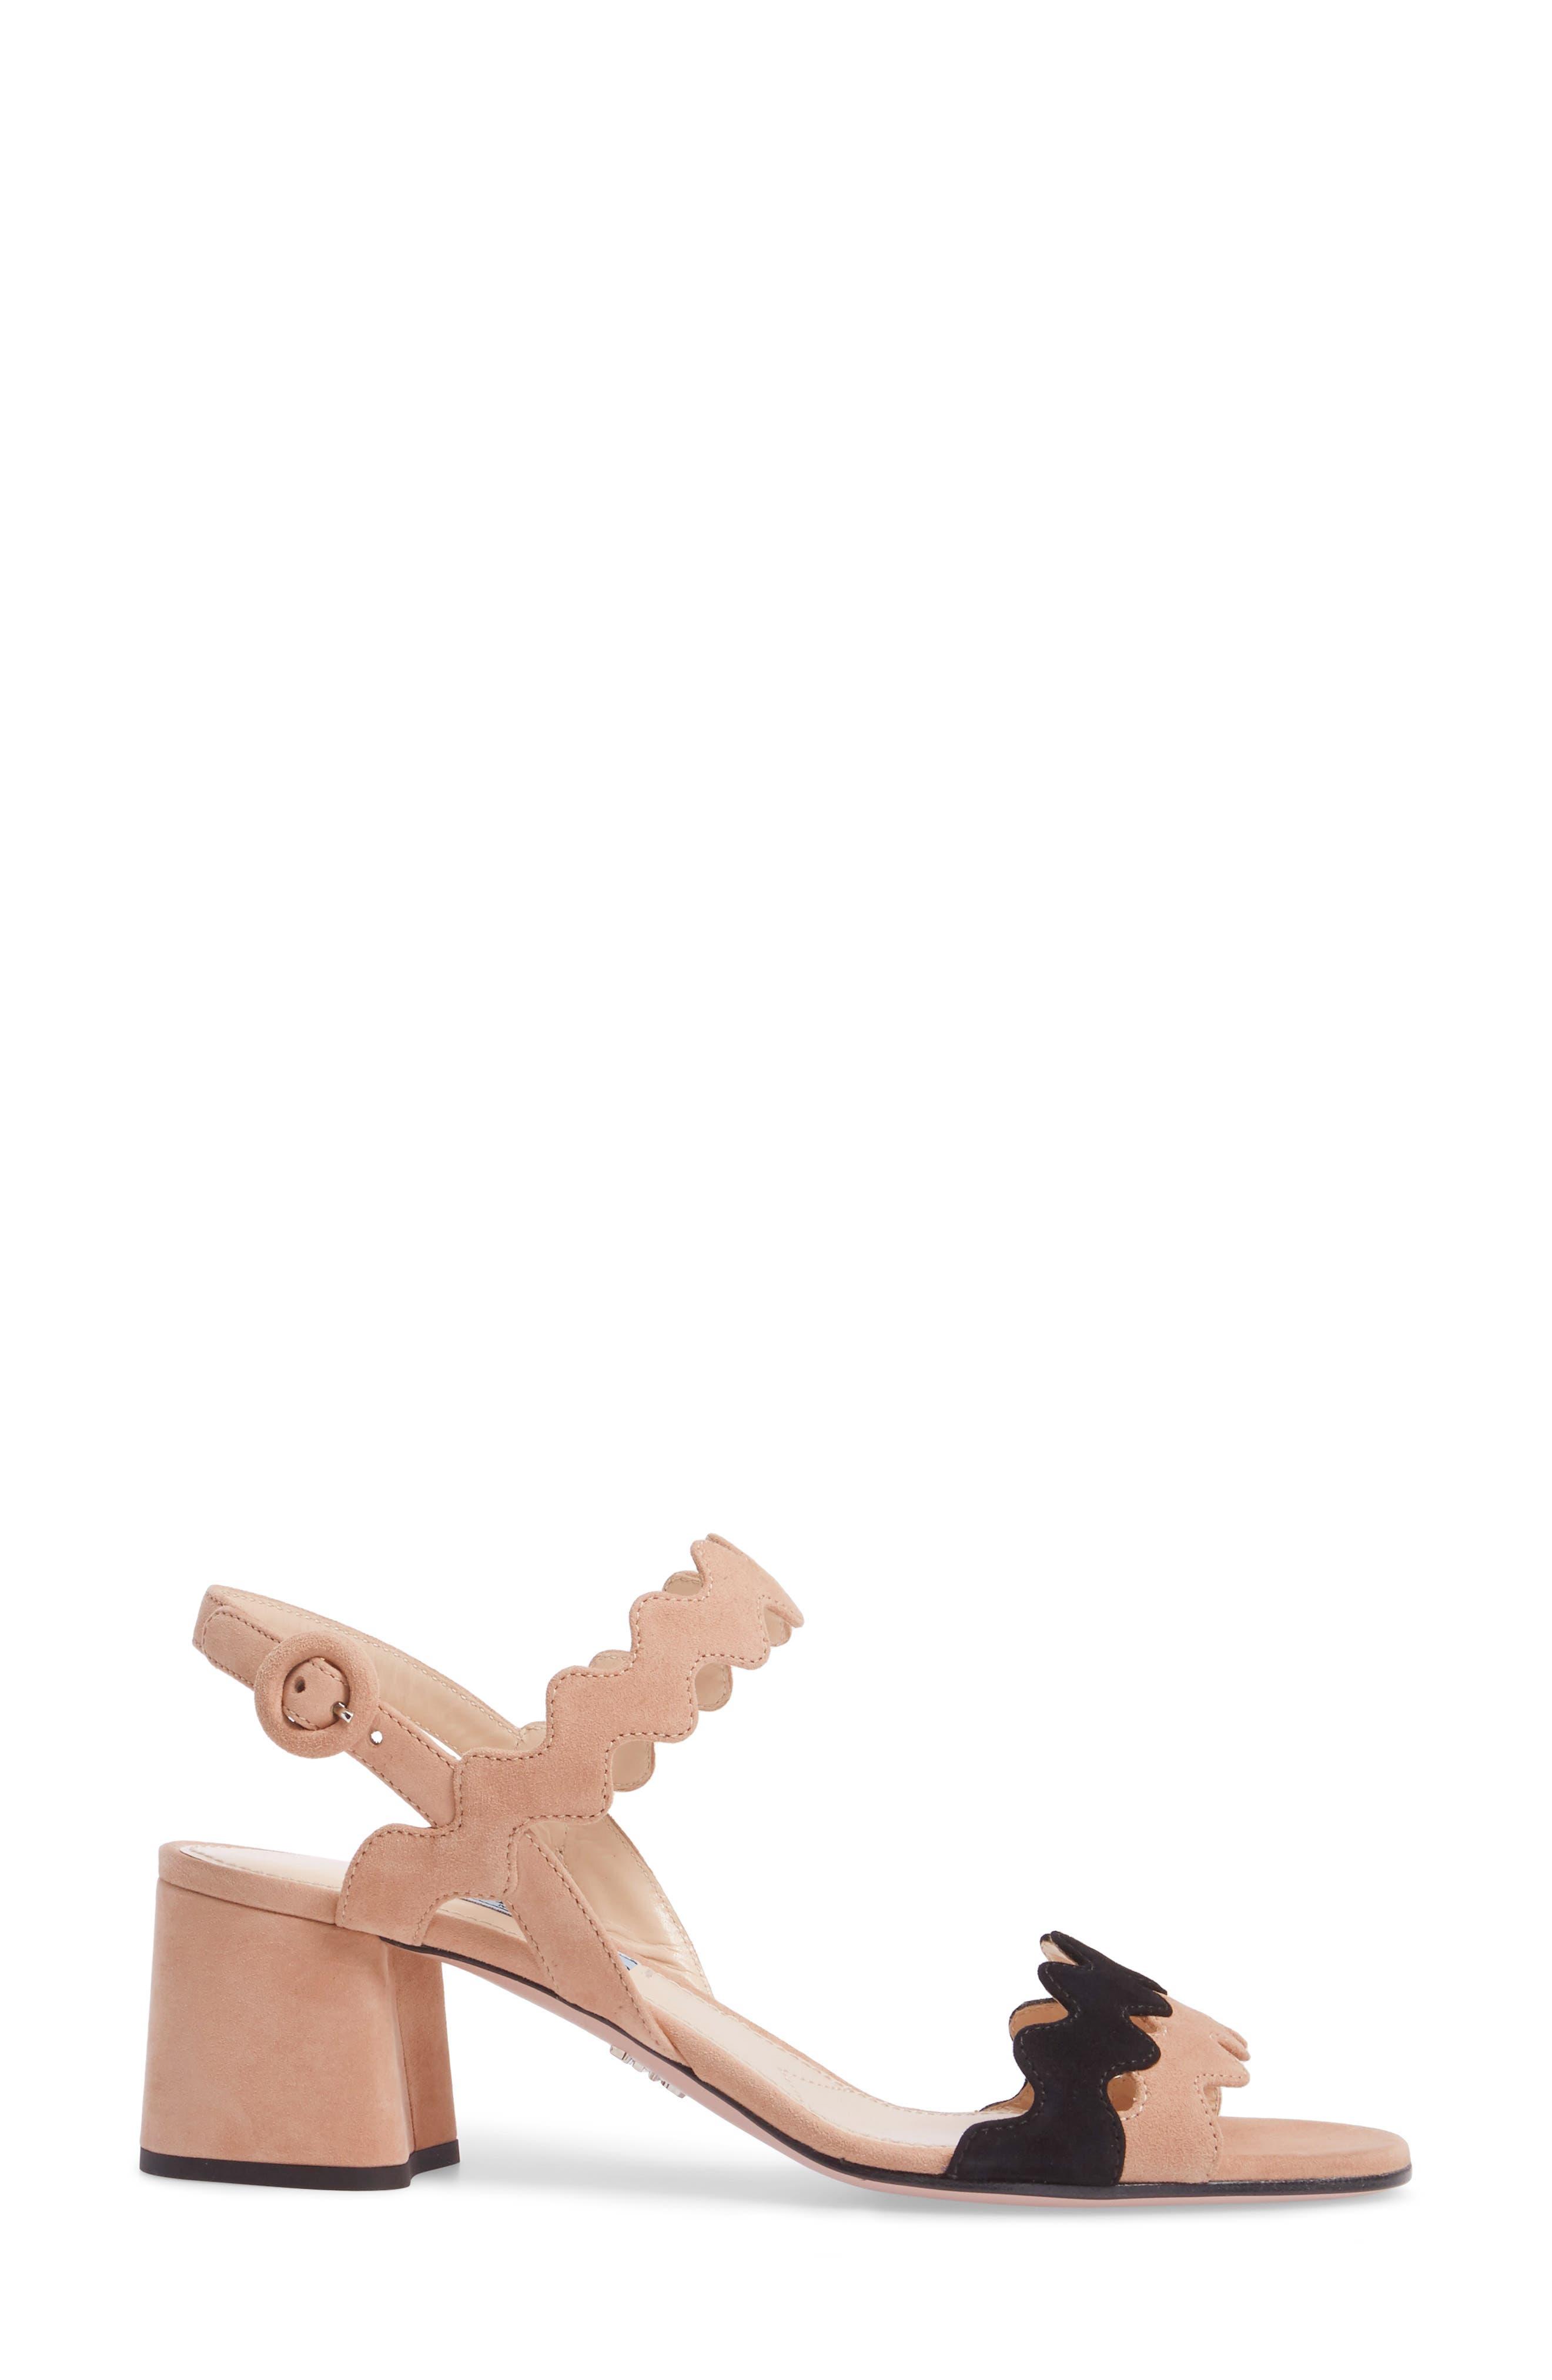 Double Strap Wave Sandal,                             Alternate thumbnail 3, color,                             Nude